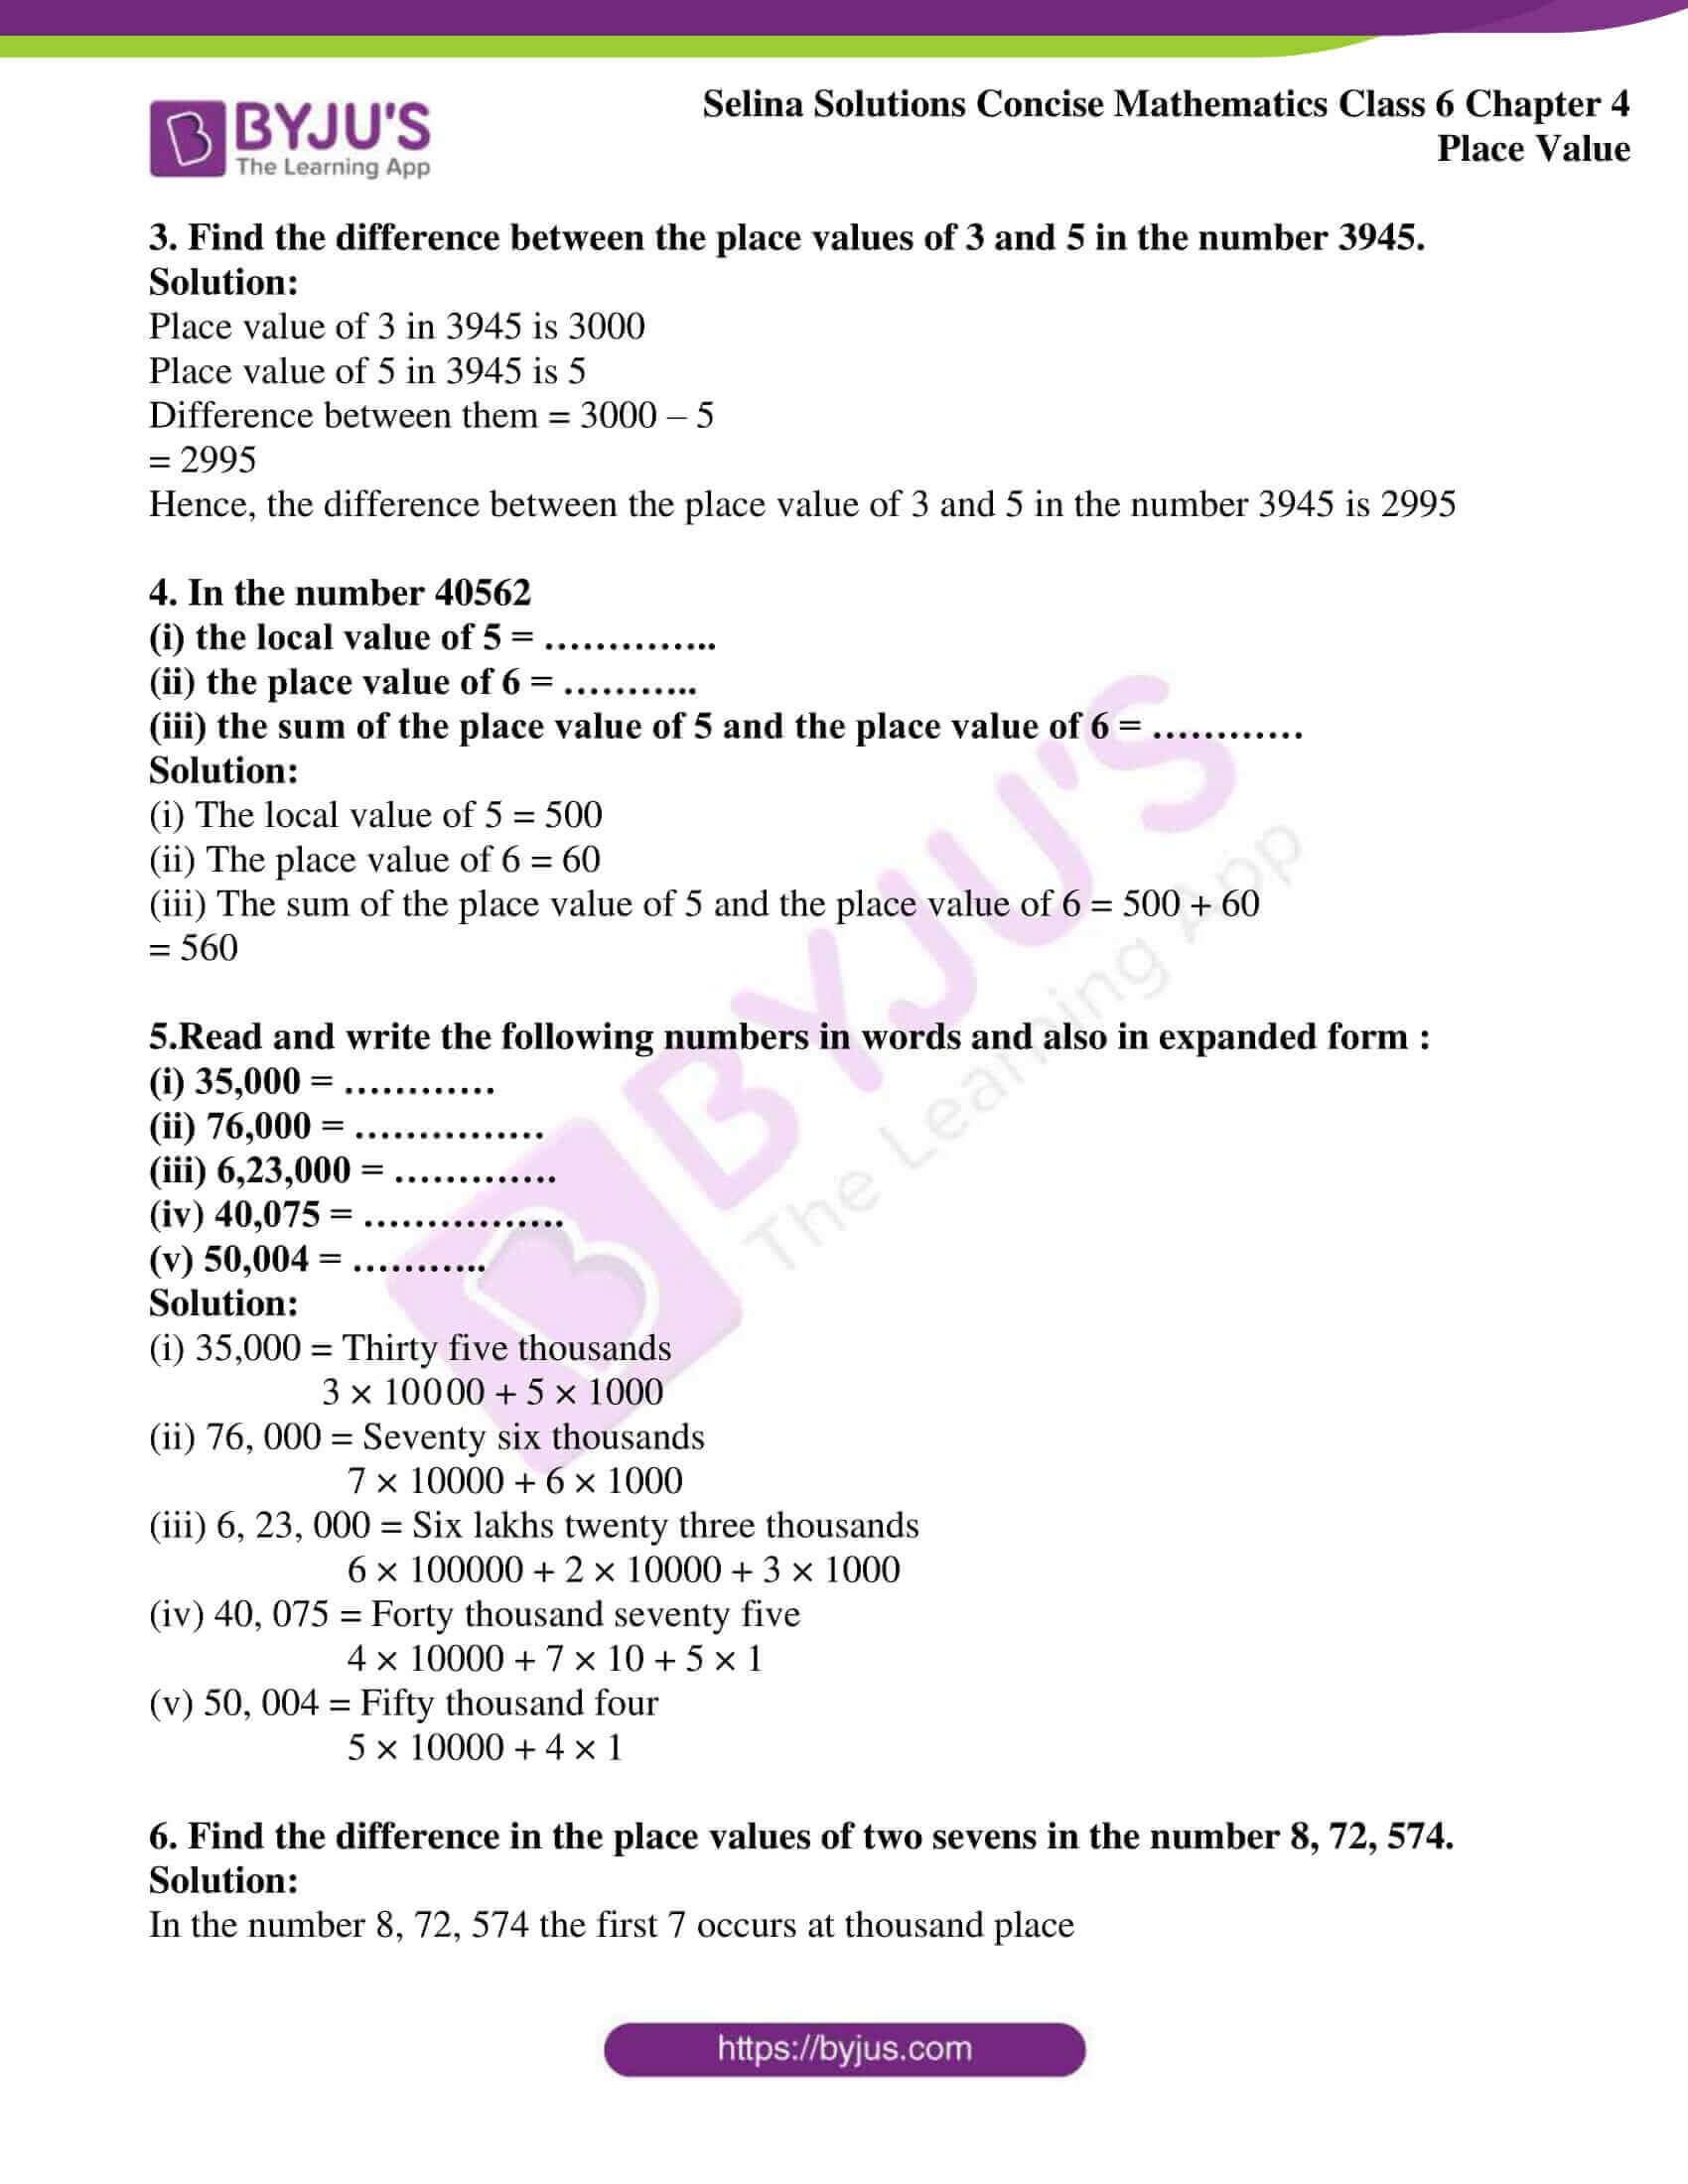 selina sol concise maths class 6 ch4 ex 4a 2